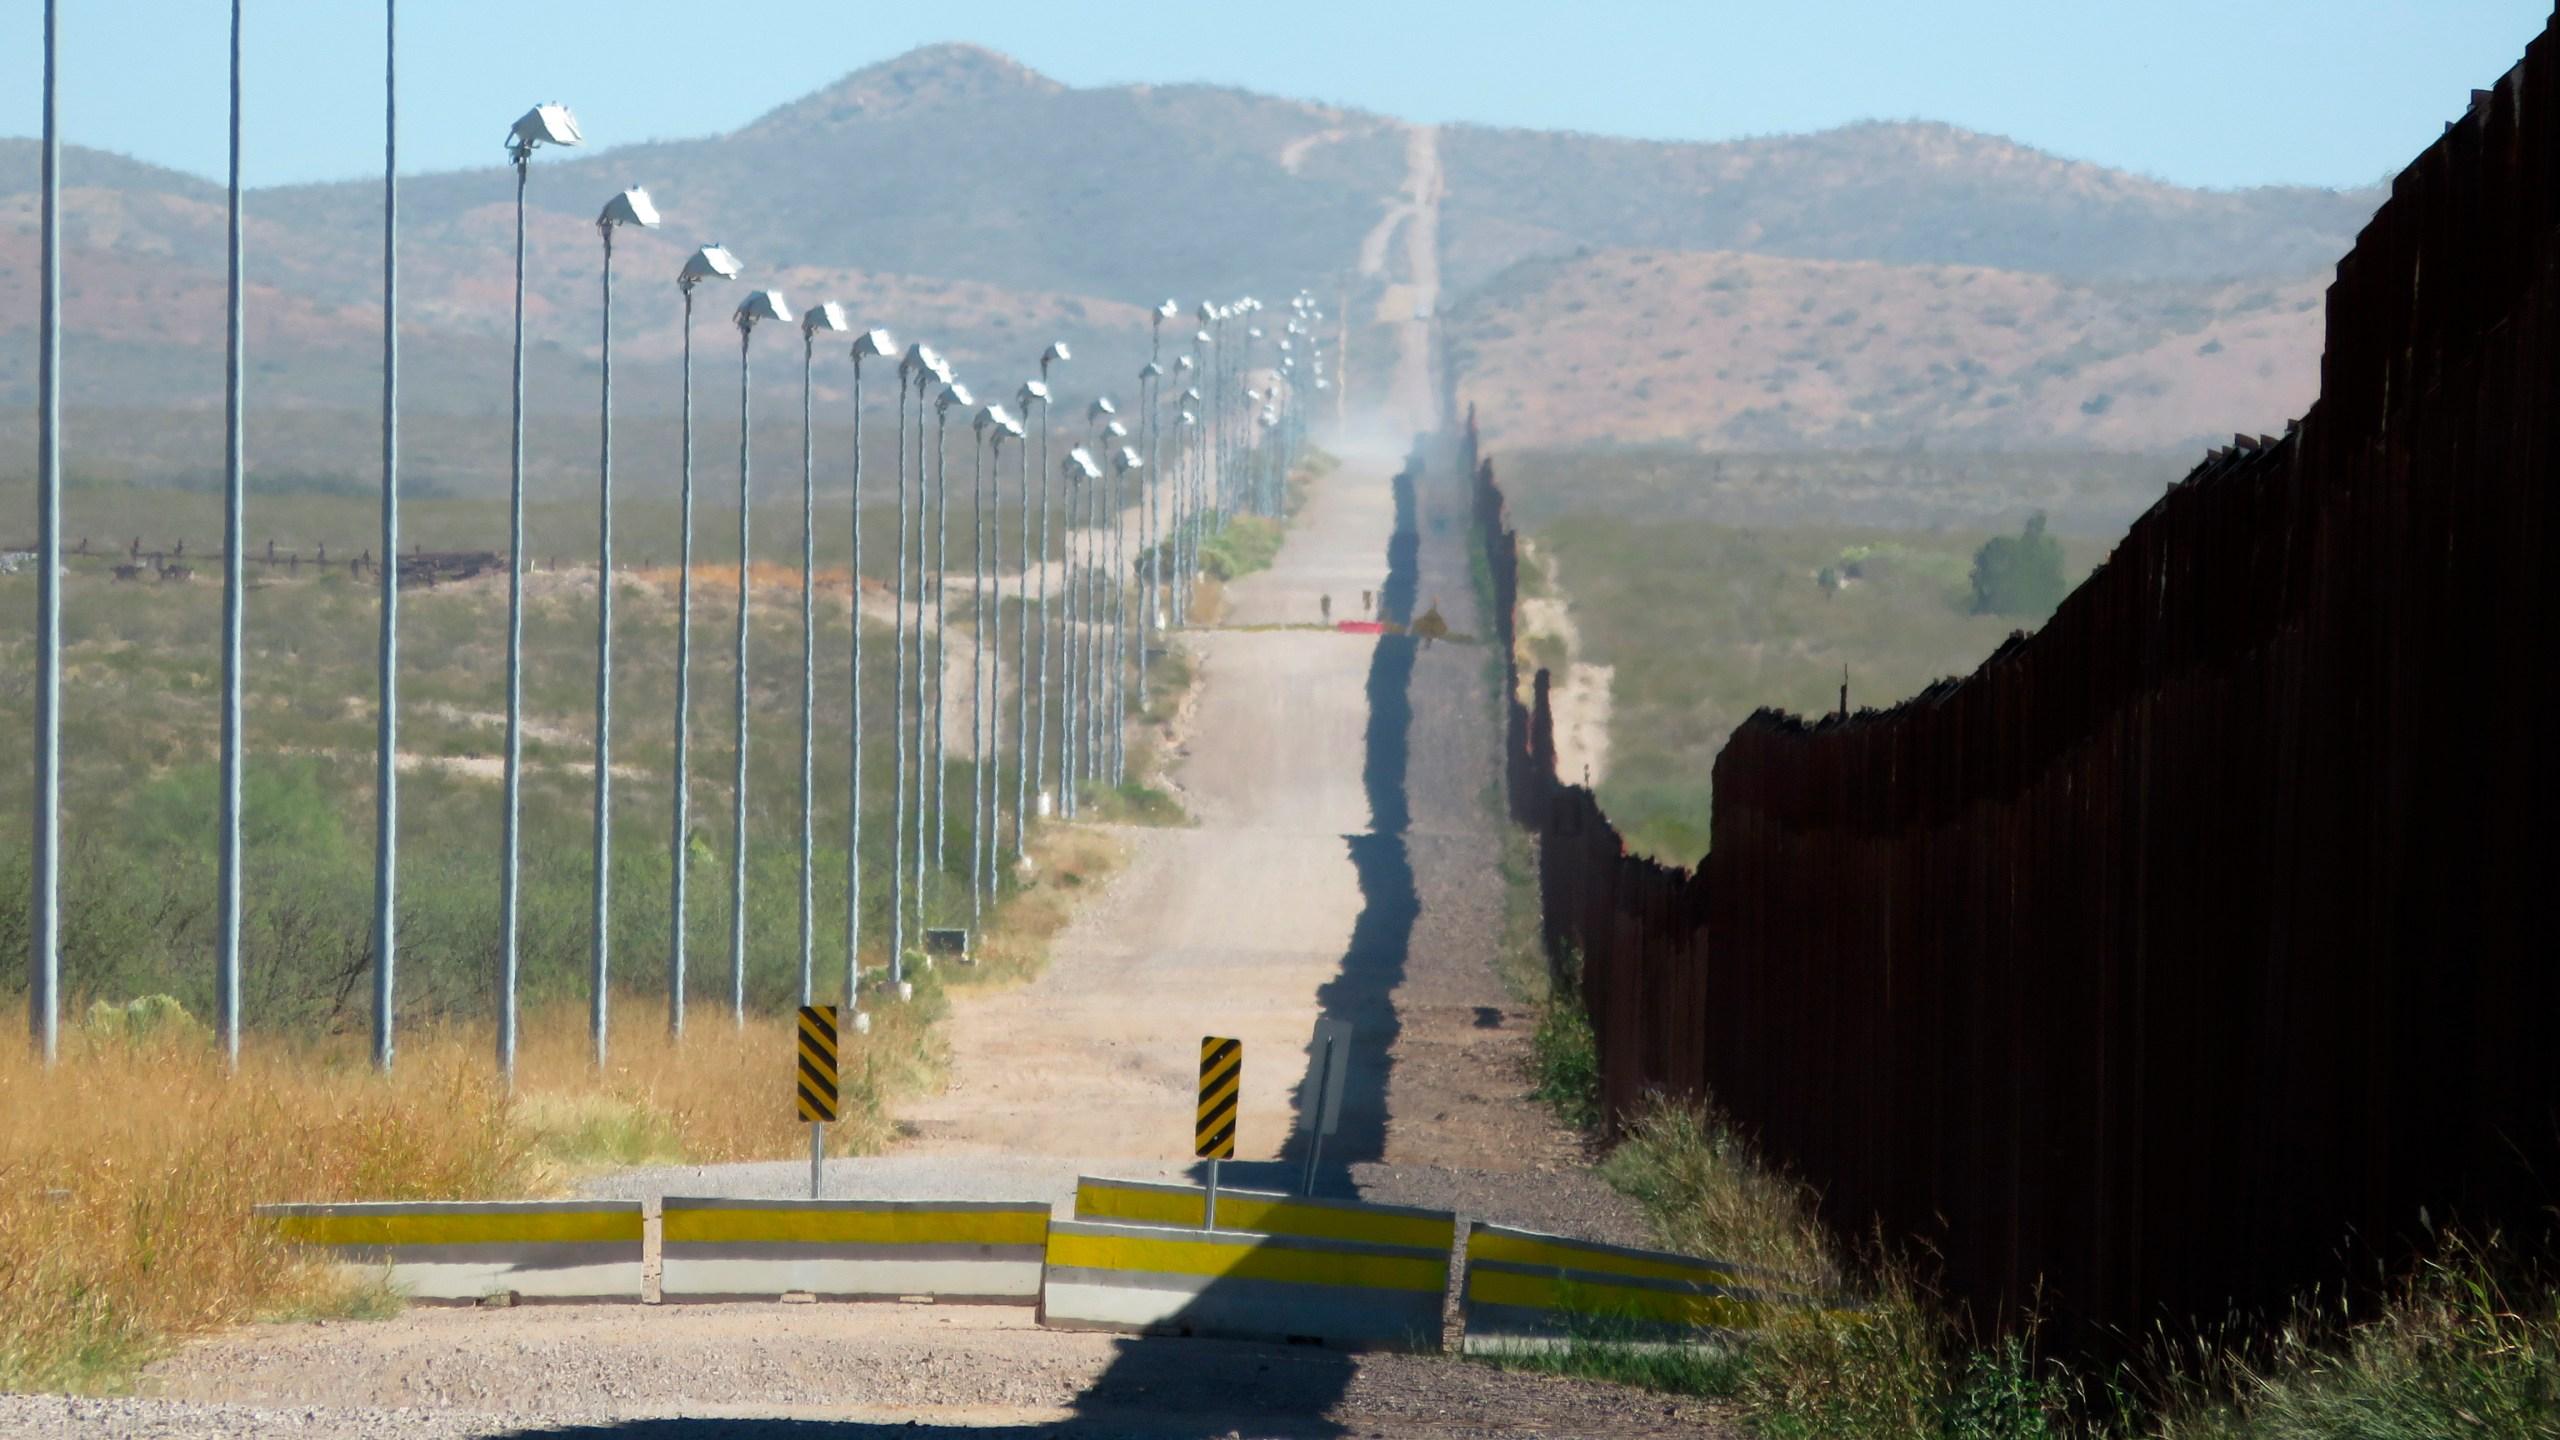 Mexico_Border_Wall-Images_88386-159532.jpg80147316